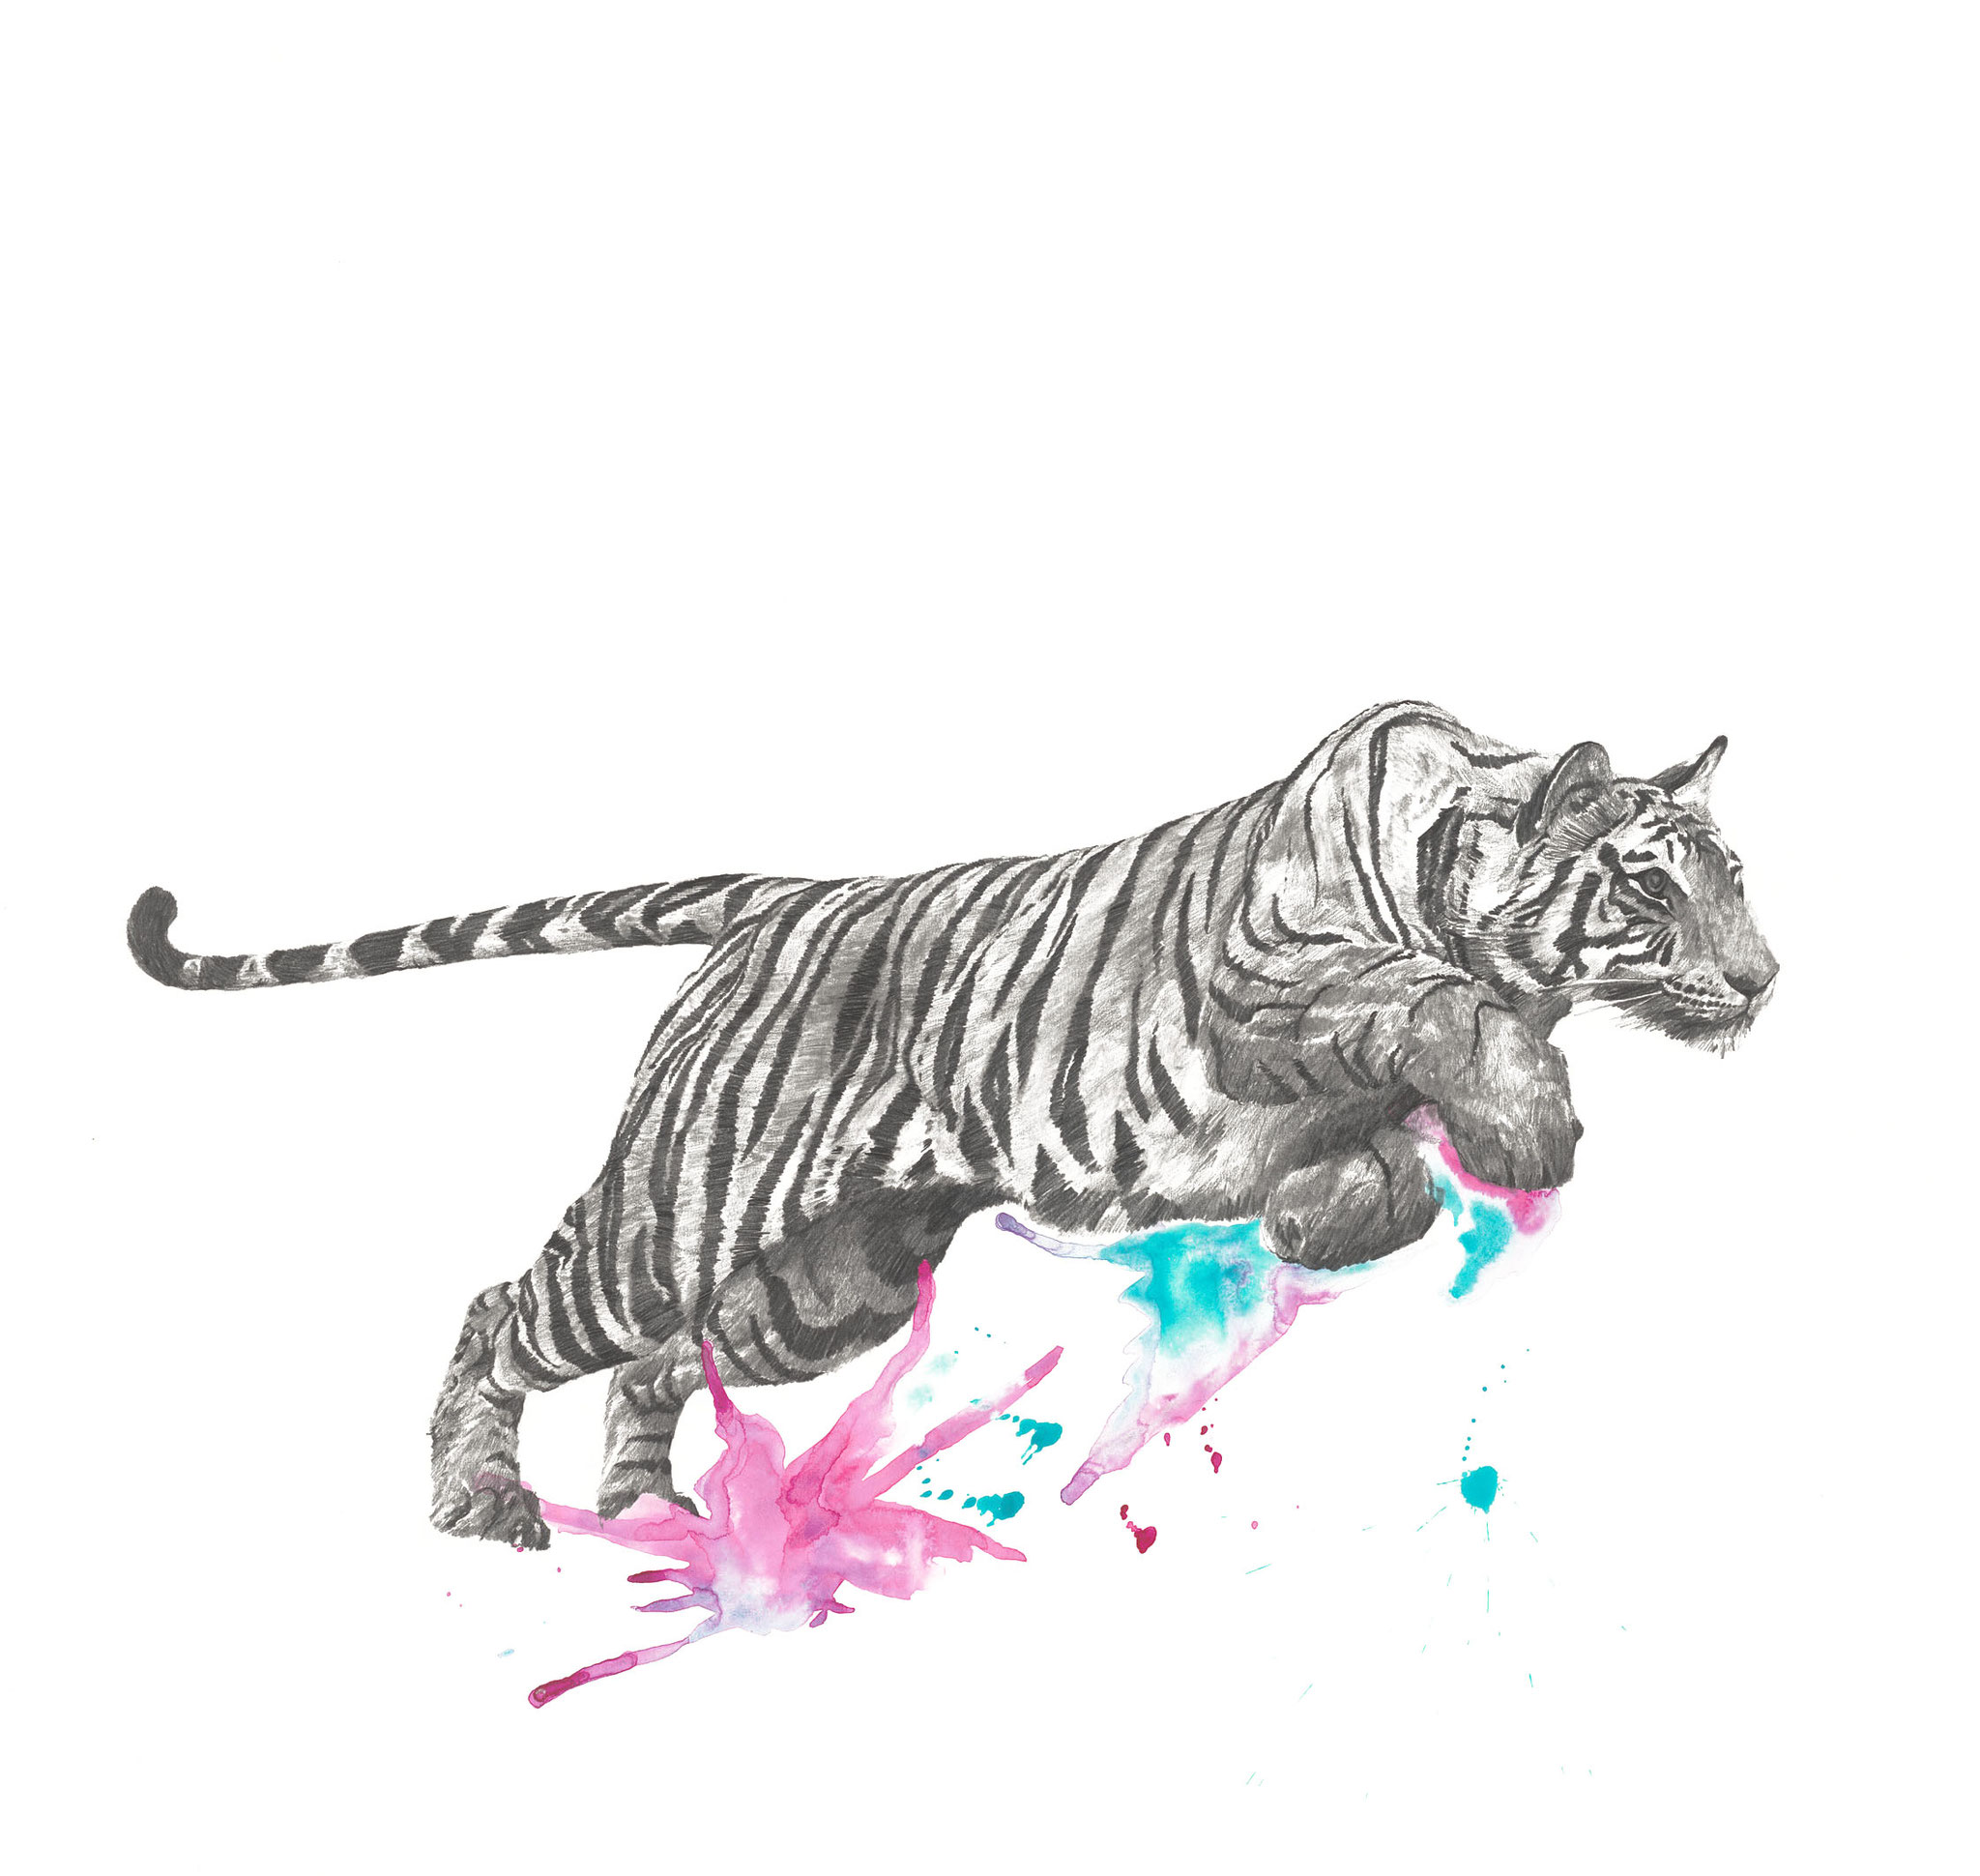 Bewegungsstudie Tiger III 70x70cm pencil, watercolor 2021